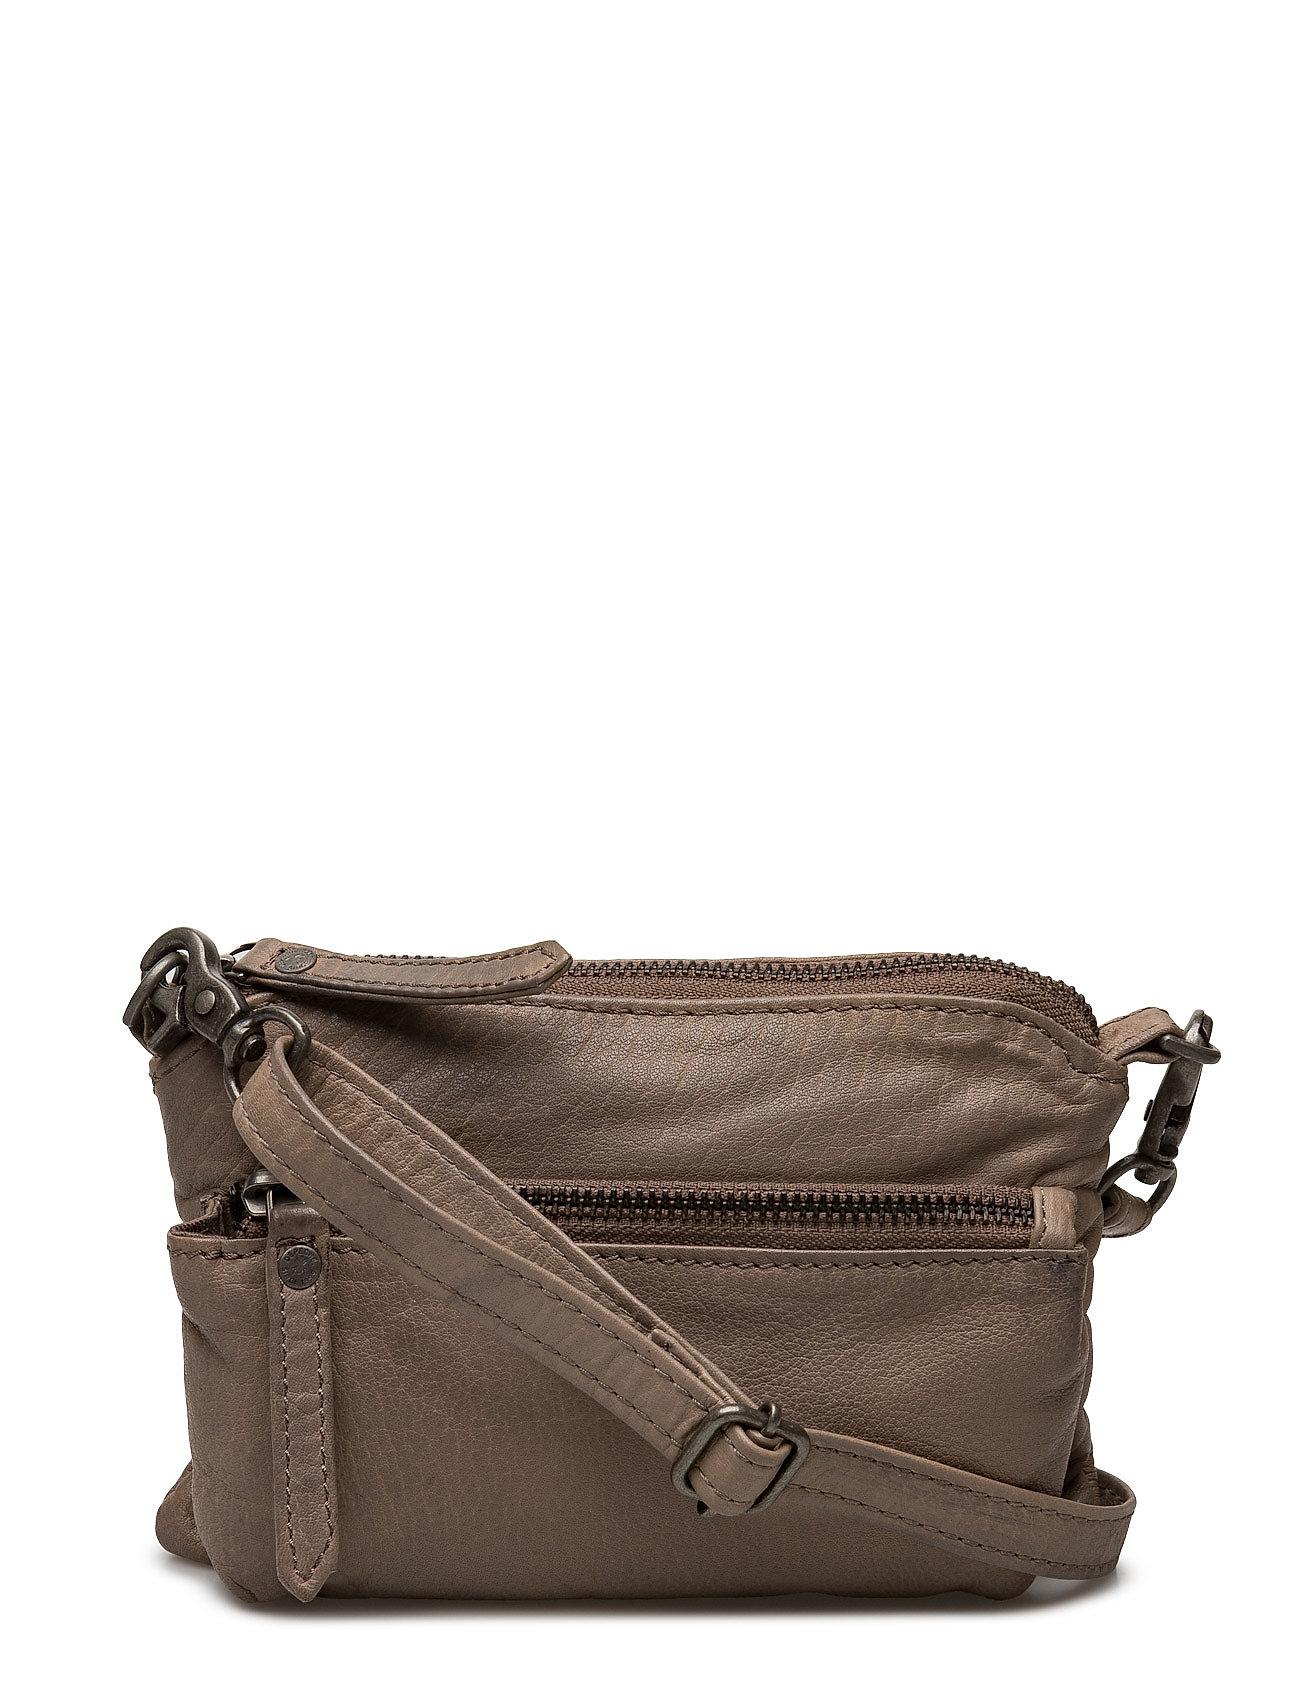 Casual Chic Small Bag / Clutch DEPECHE Små tasker til Damer i Taupe